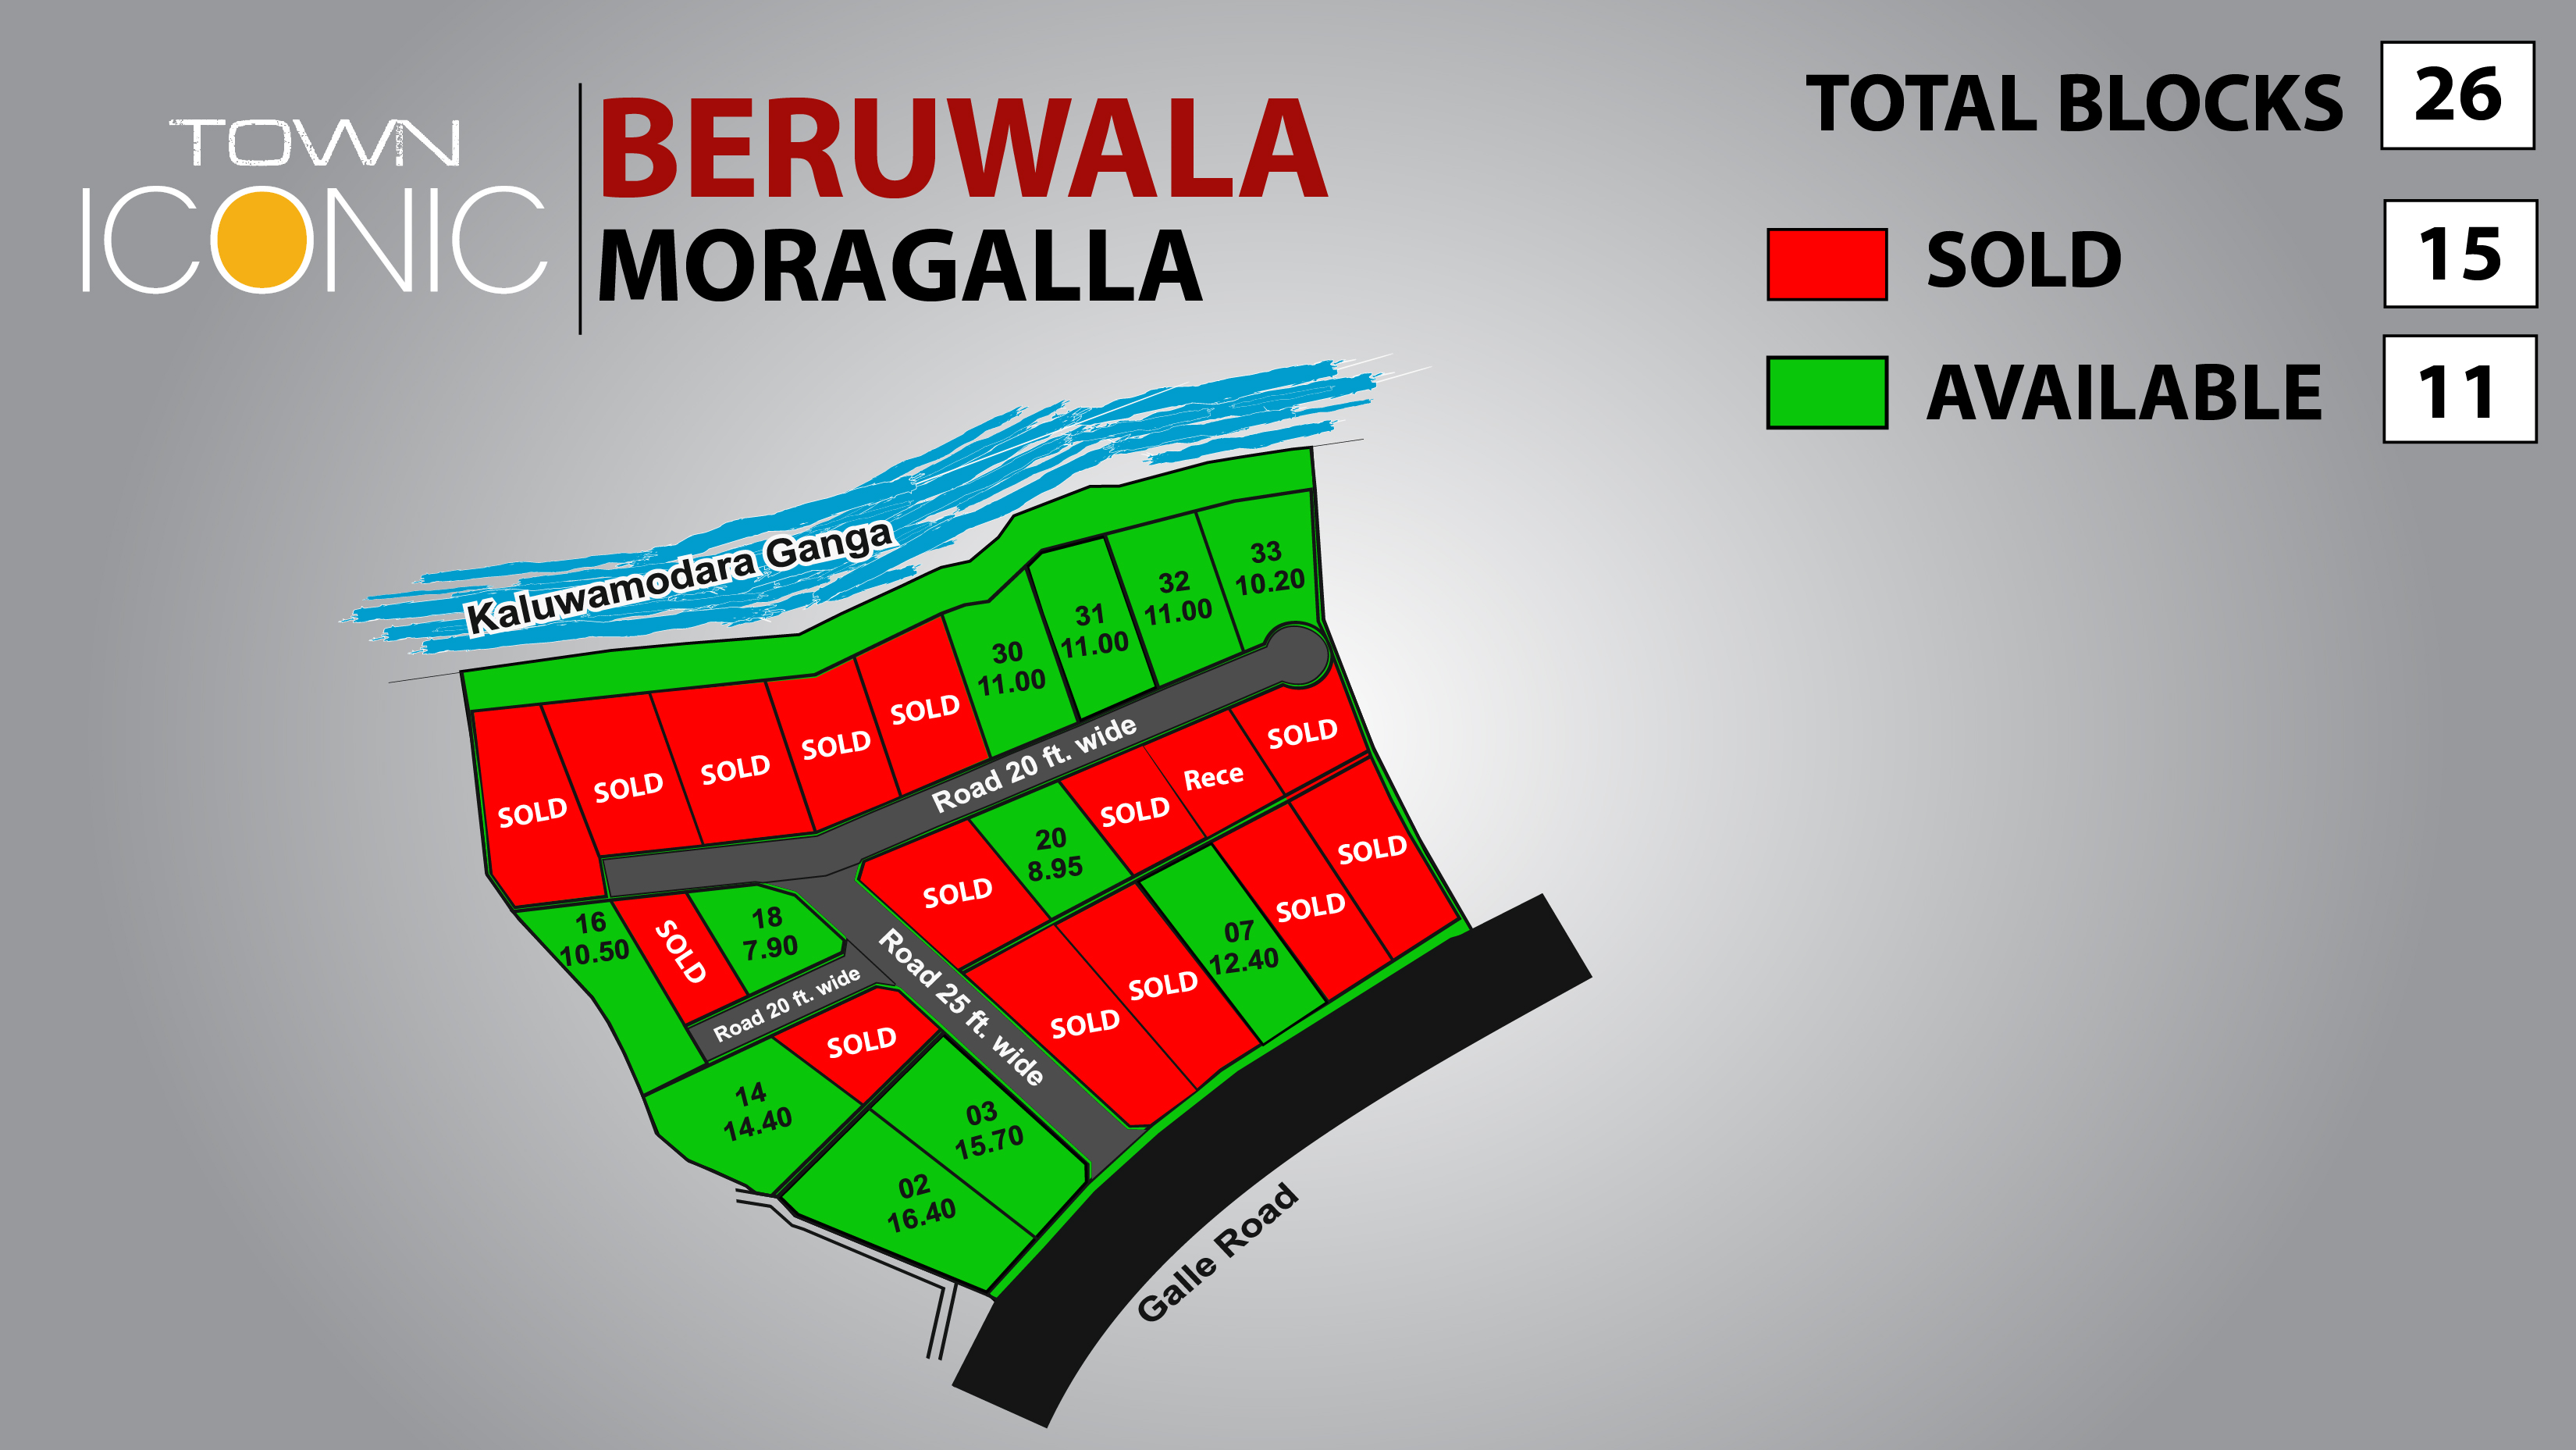 Beruwala – Town Iconic